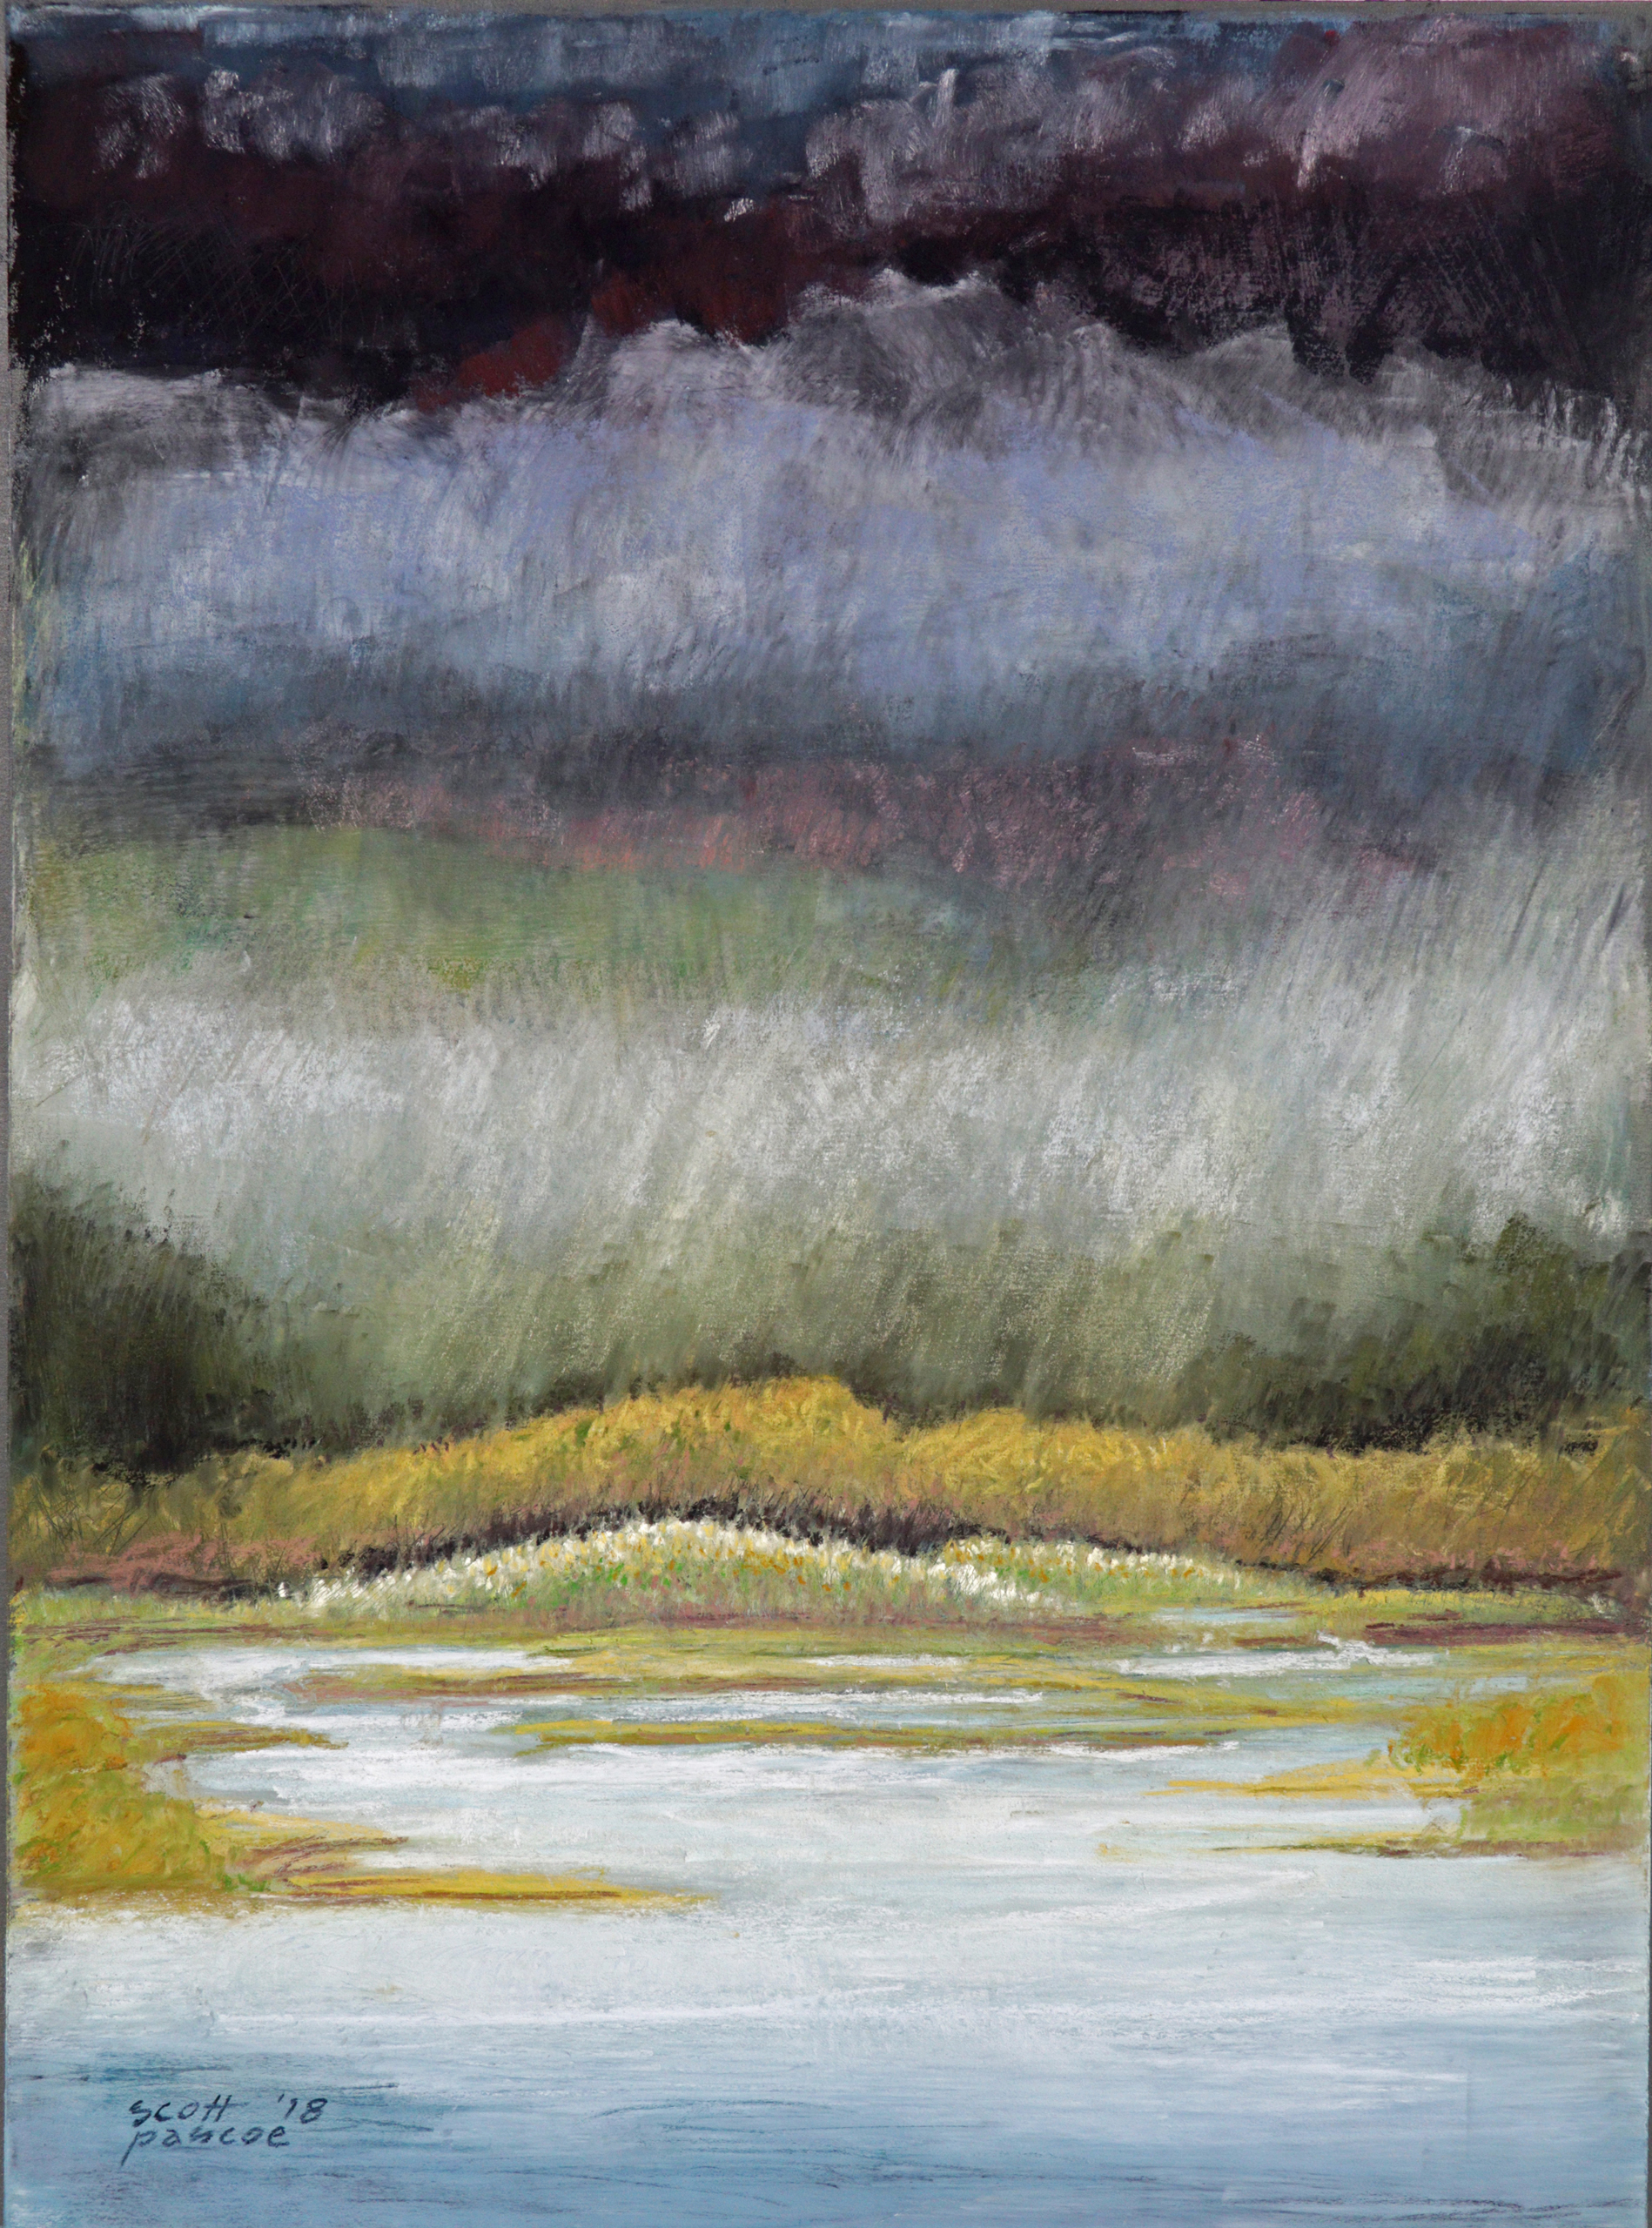 Landfall-Inner Bay Tidal 16x12 Soft Pastel - SOLD